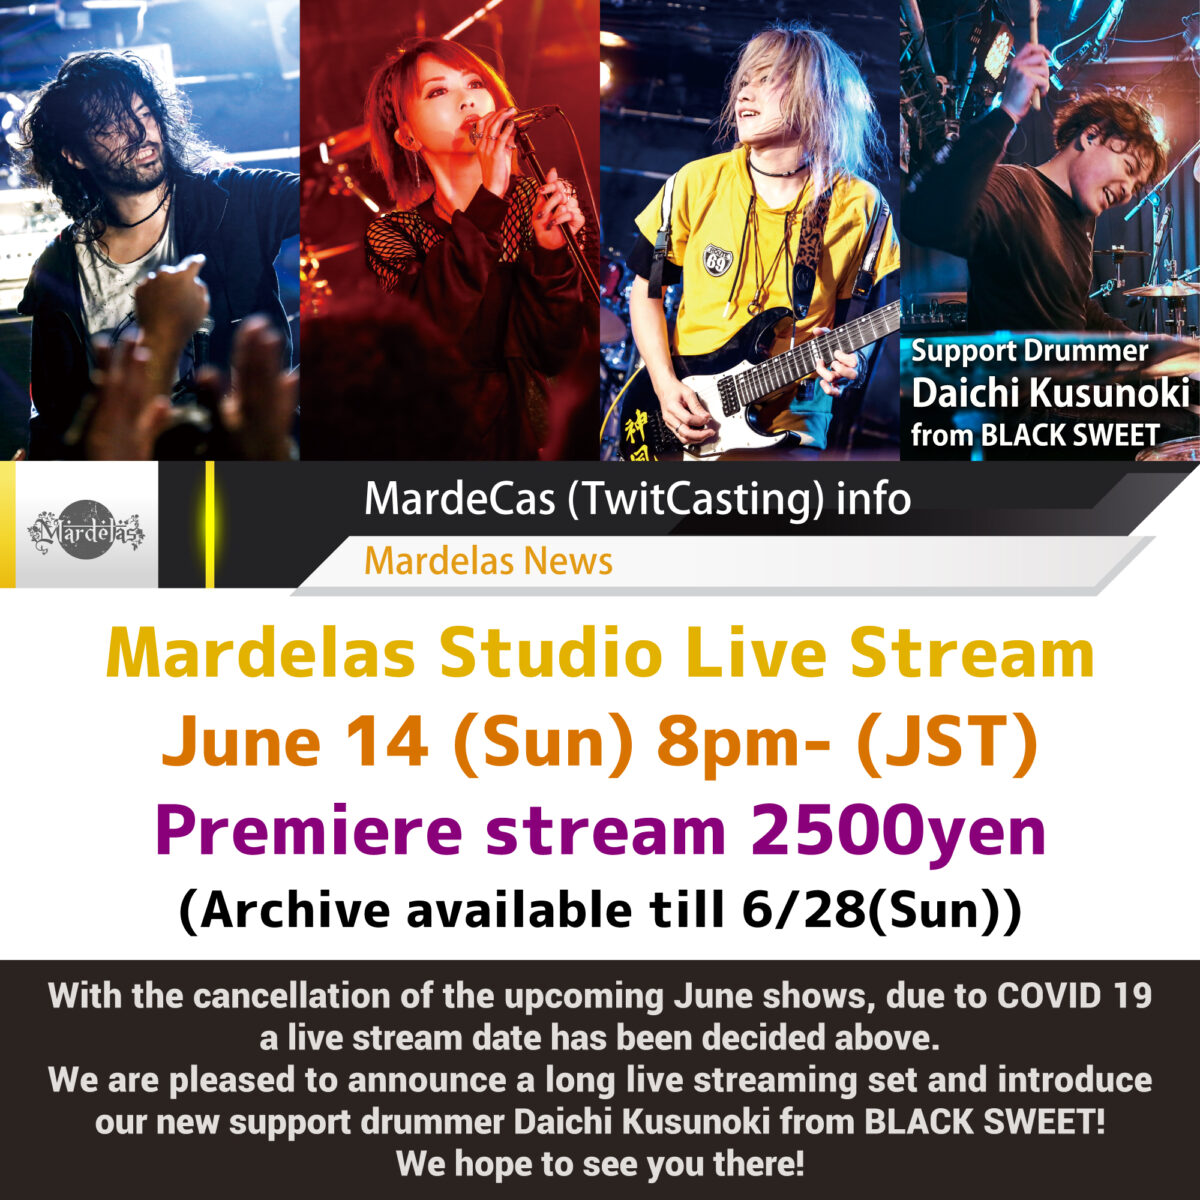 Mardelas - Twitcasting Premium Live